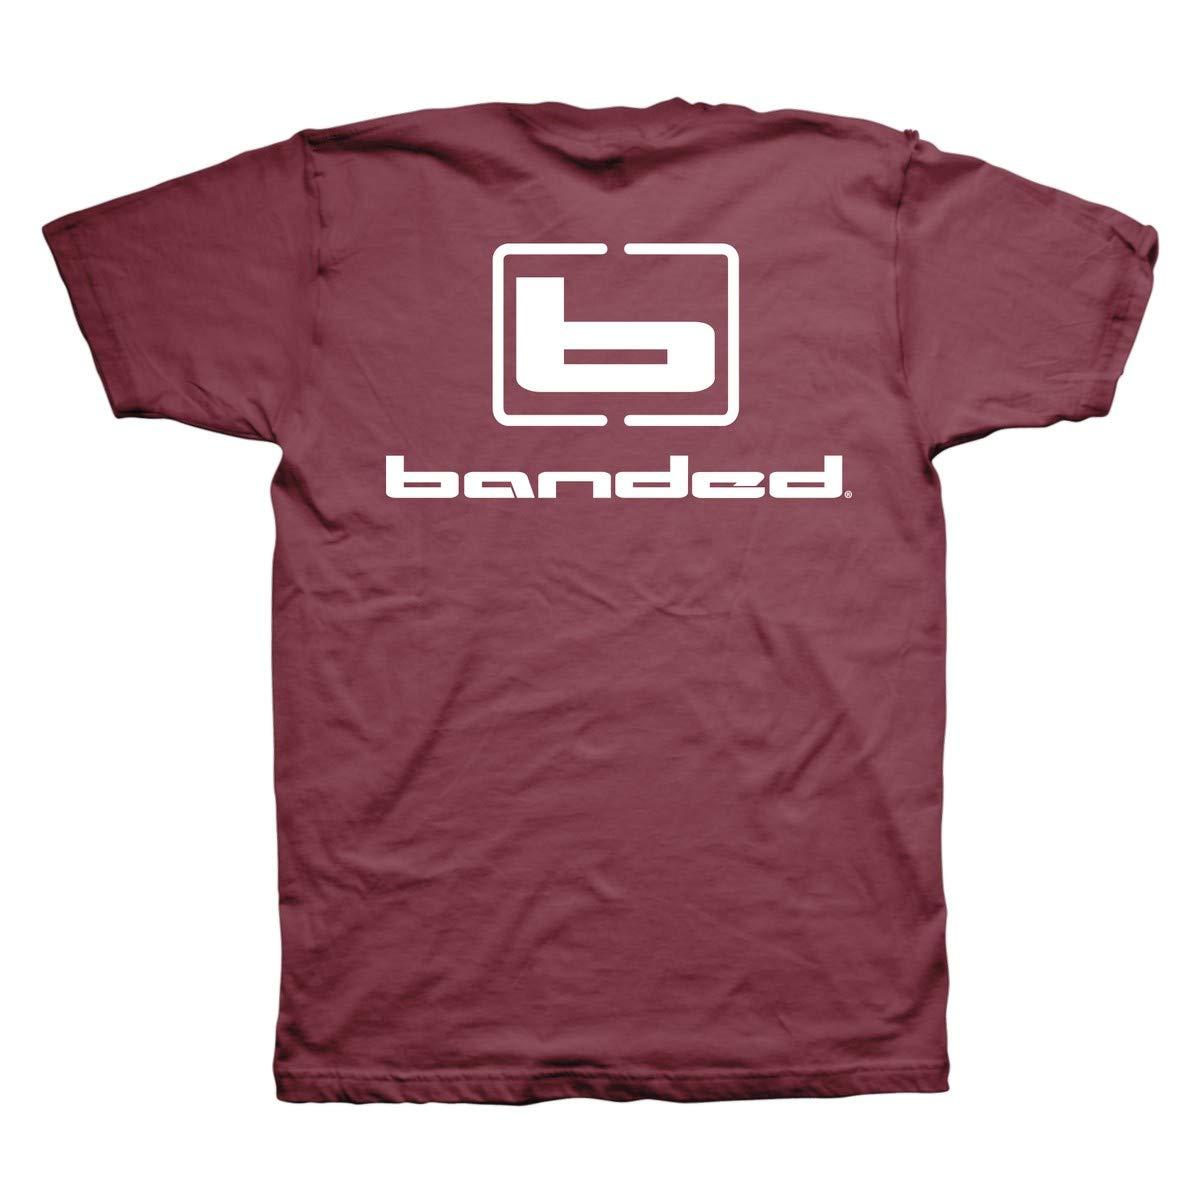 Banded Signature Short Sleeve T-Shirt